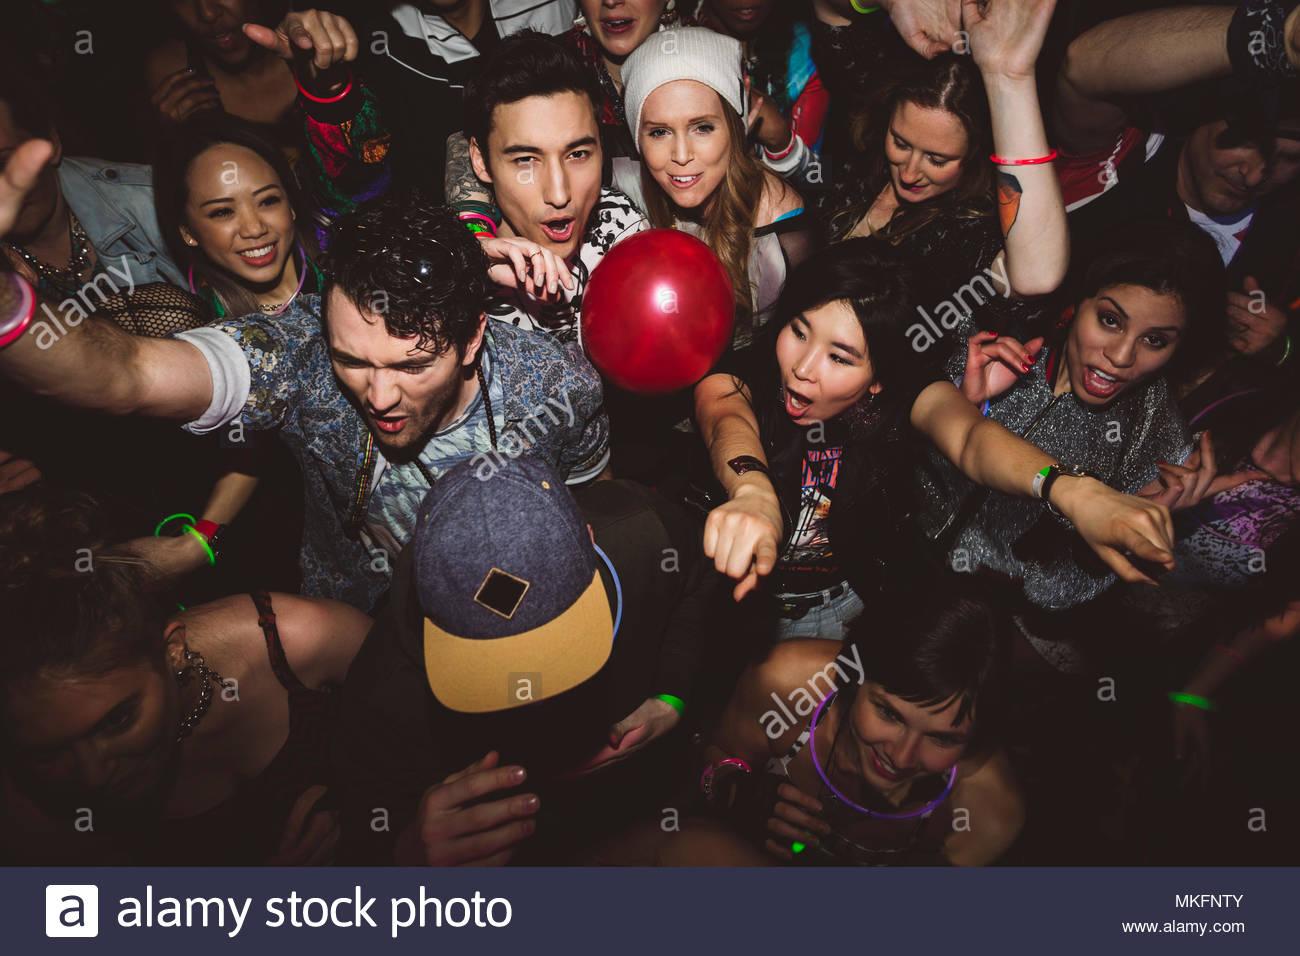 Carefree milennials dancing, partying in nightclub - Stock Image